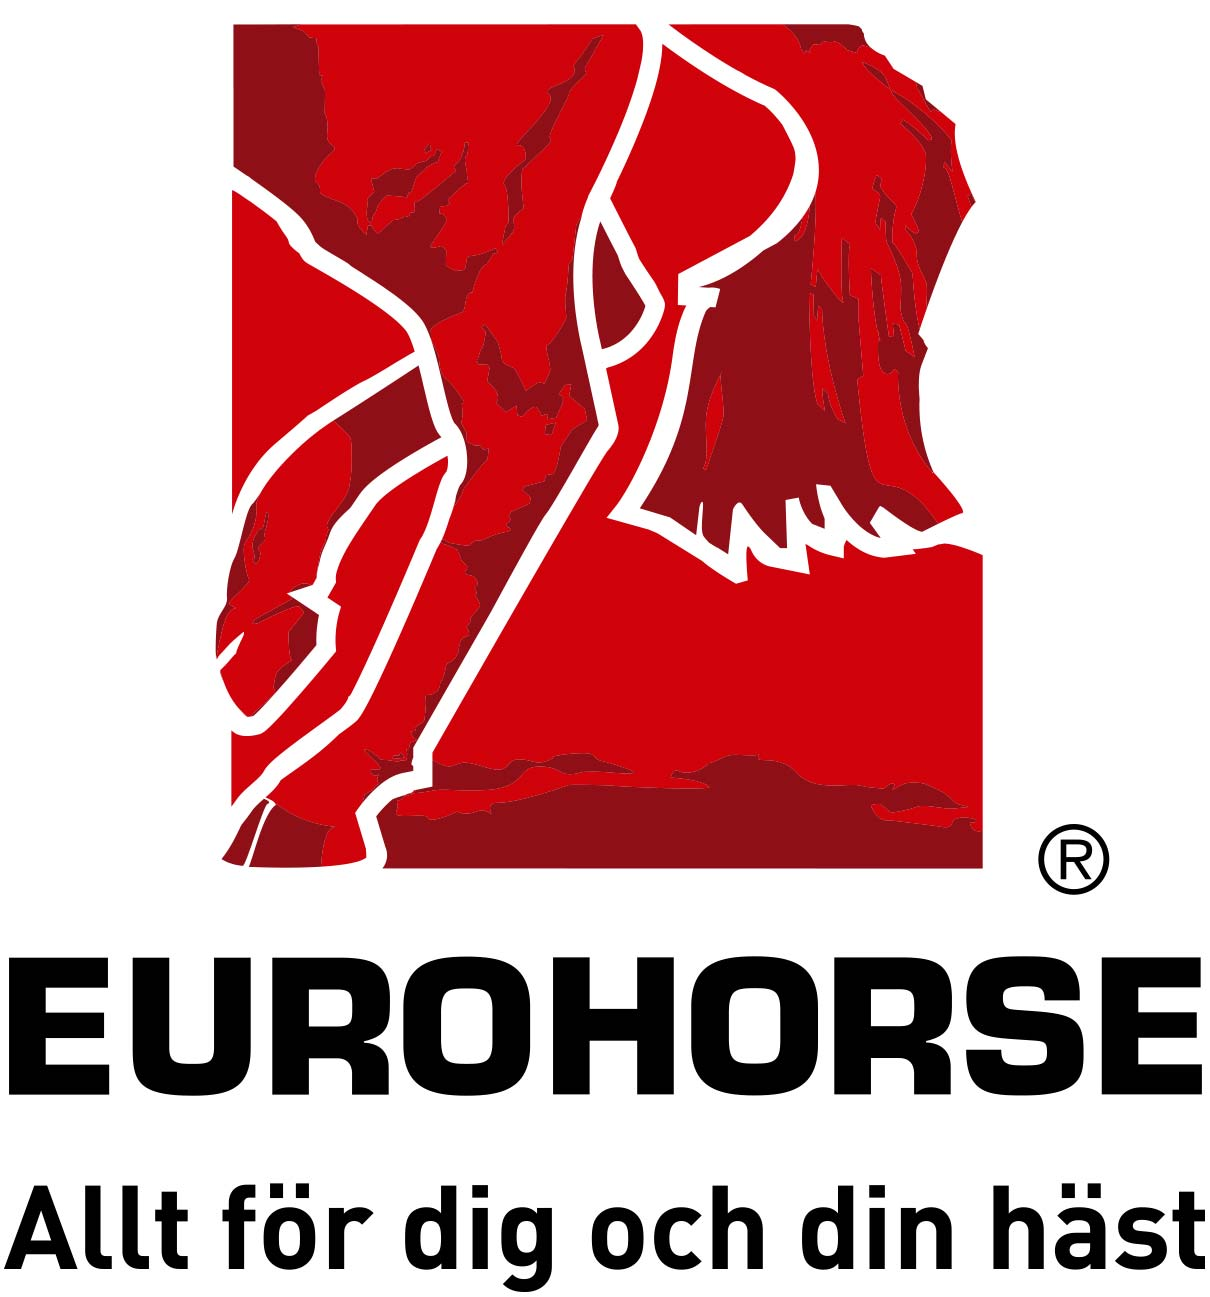 Eurohorse logo